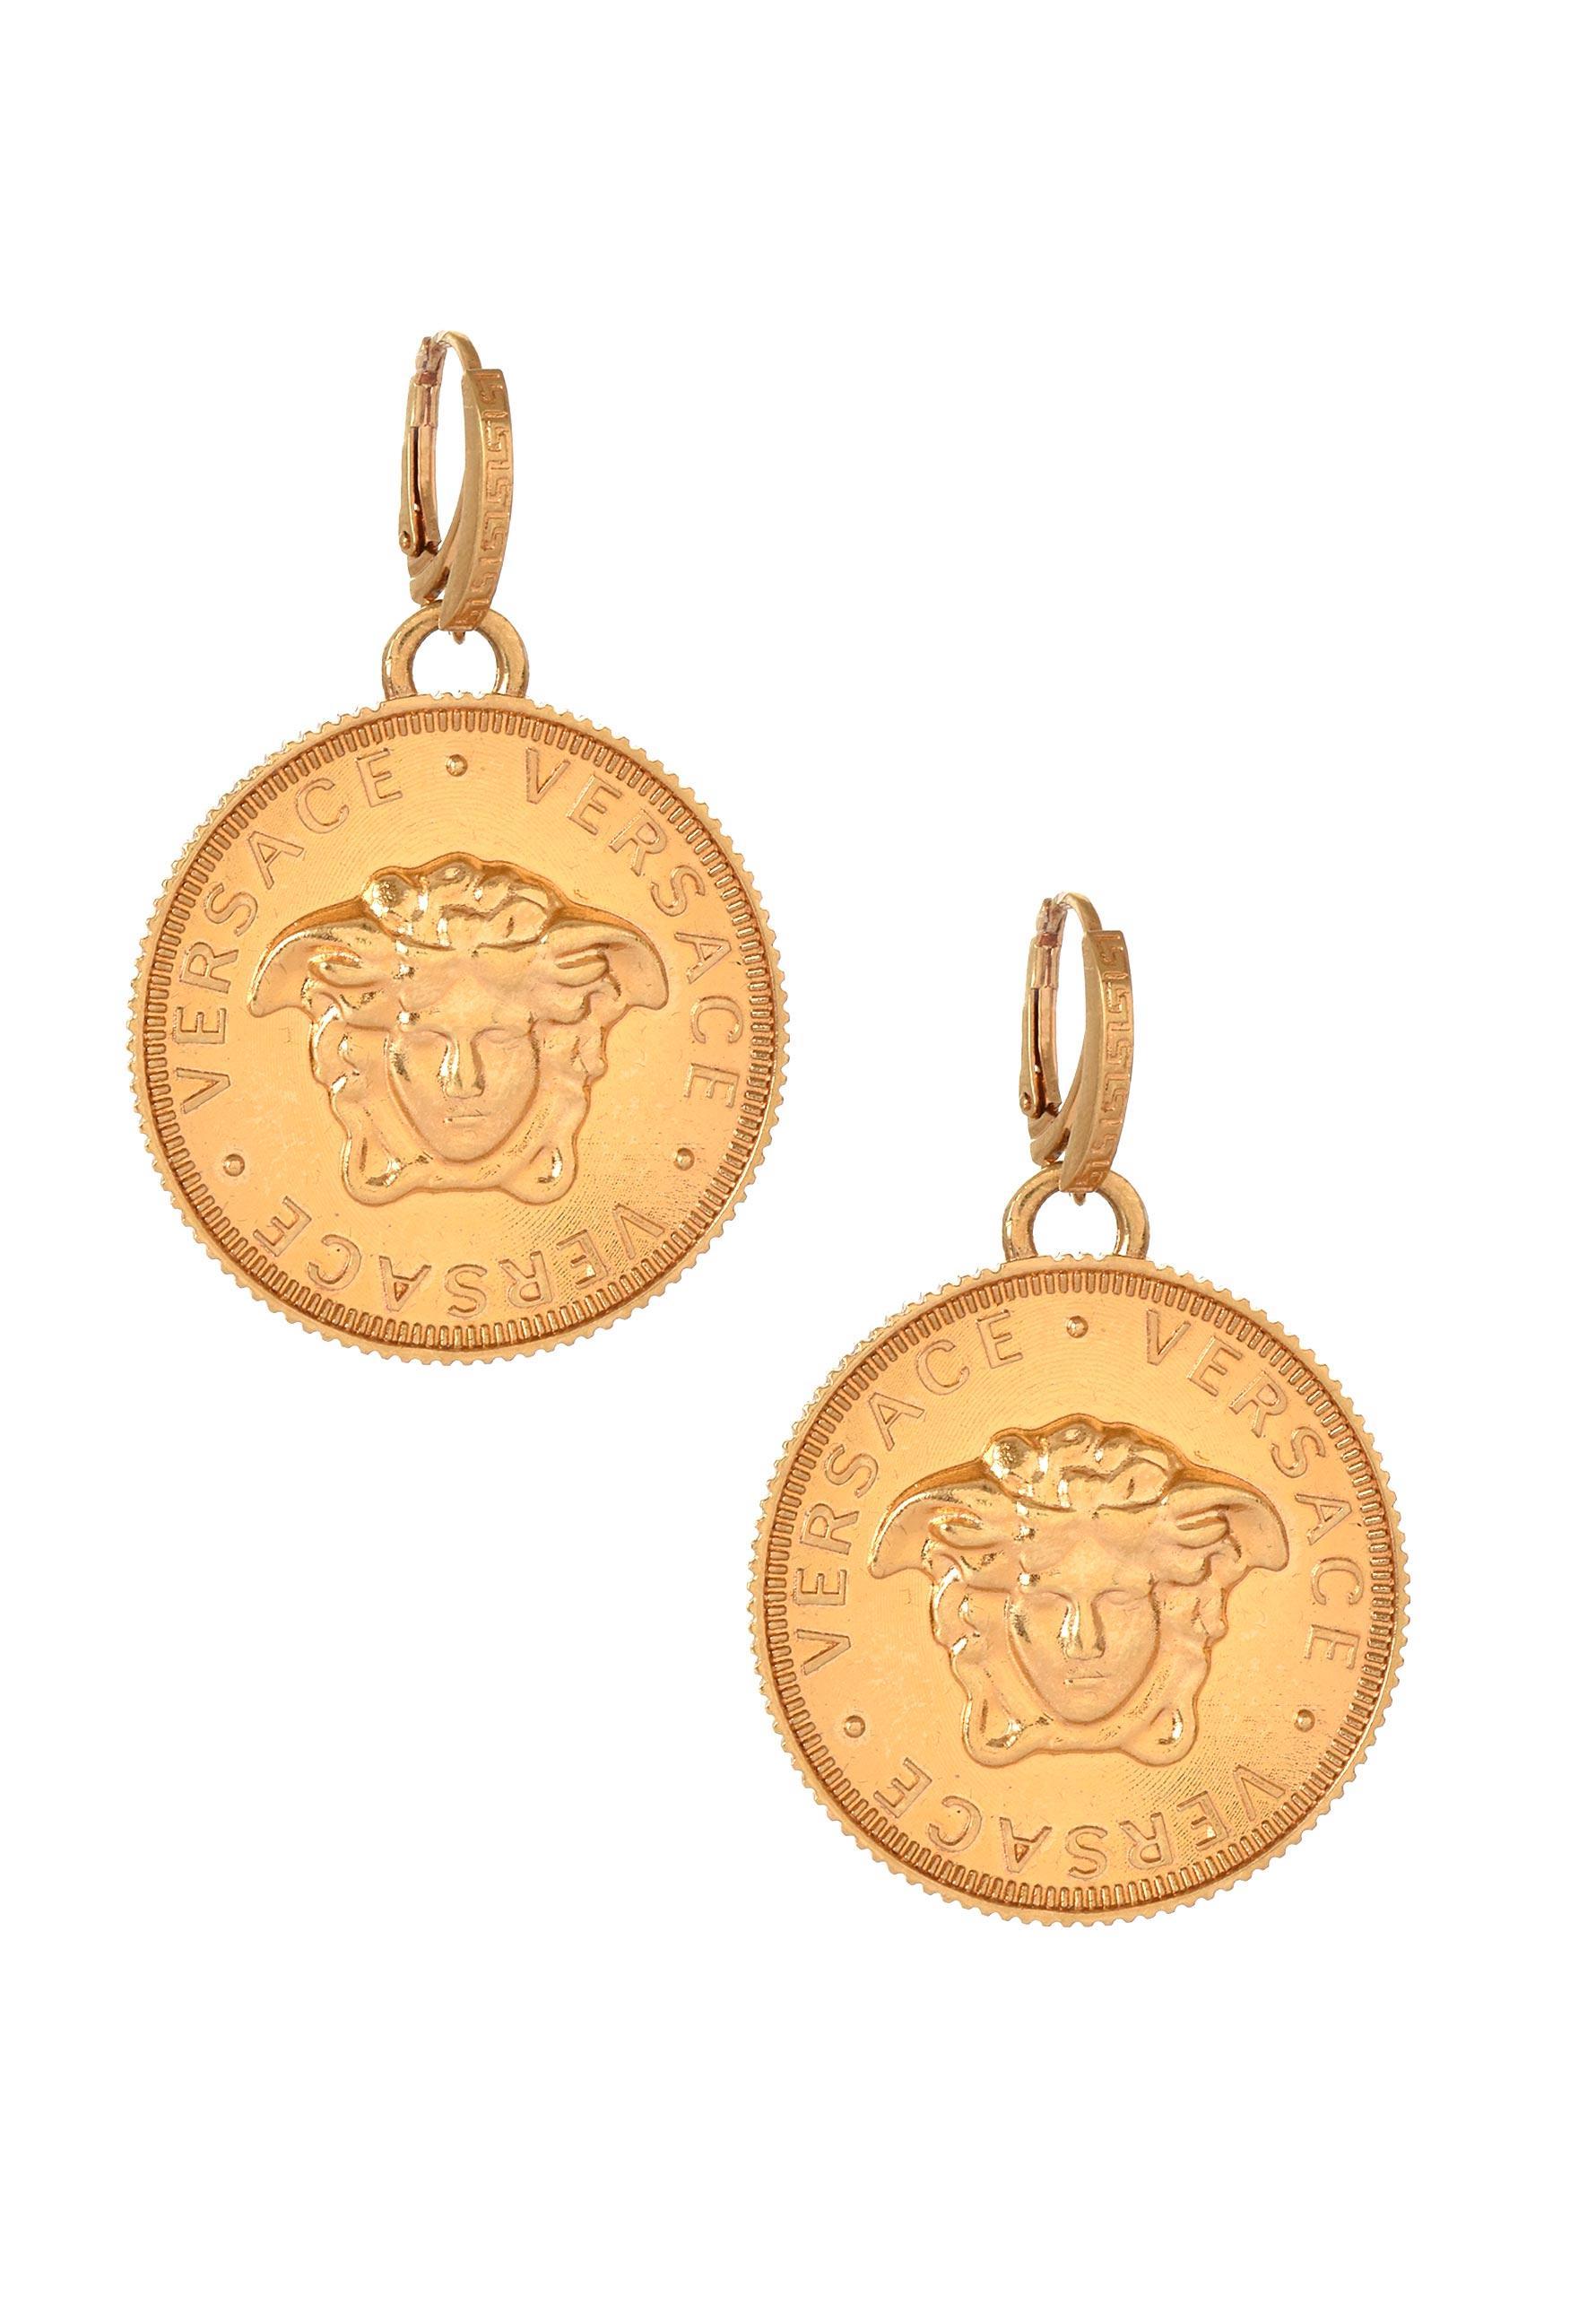 d2592d2d3 Versace Vintage Medusa Head Coin Earrings Tribute Gold in Metallic ...